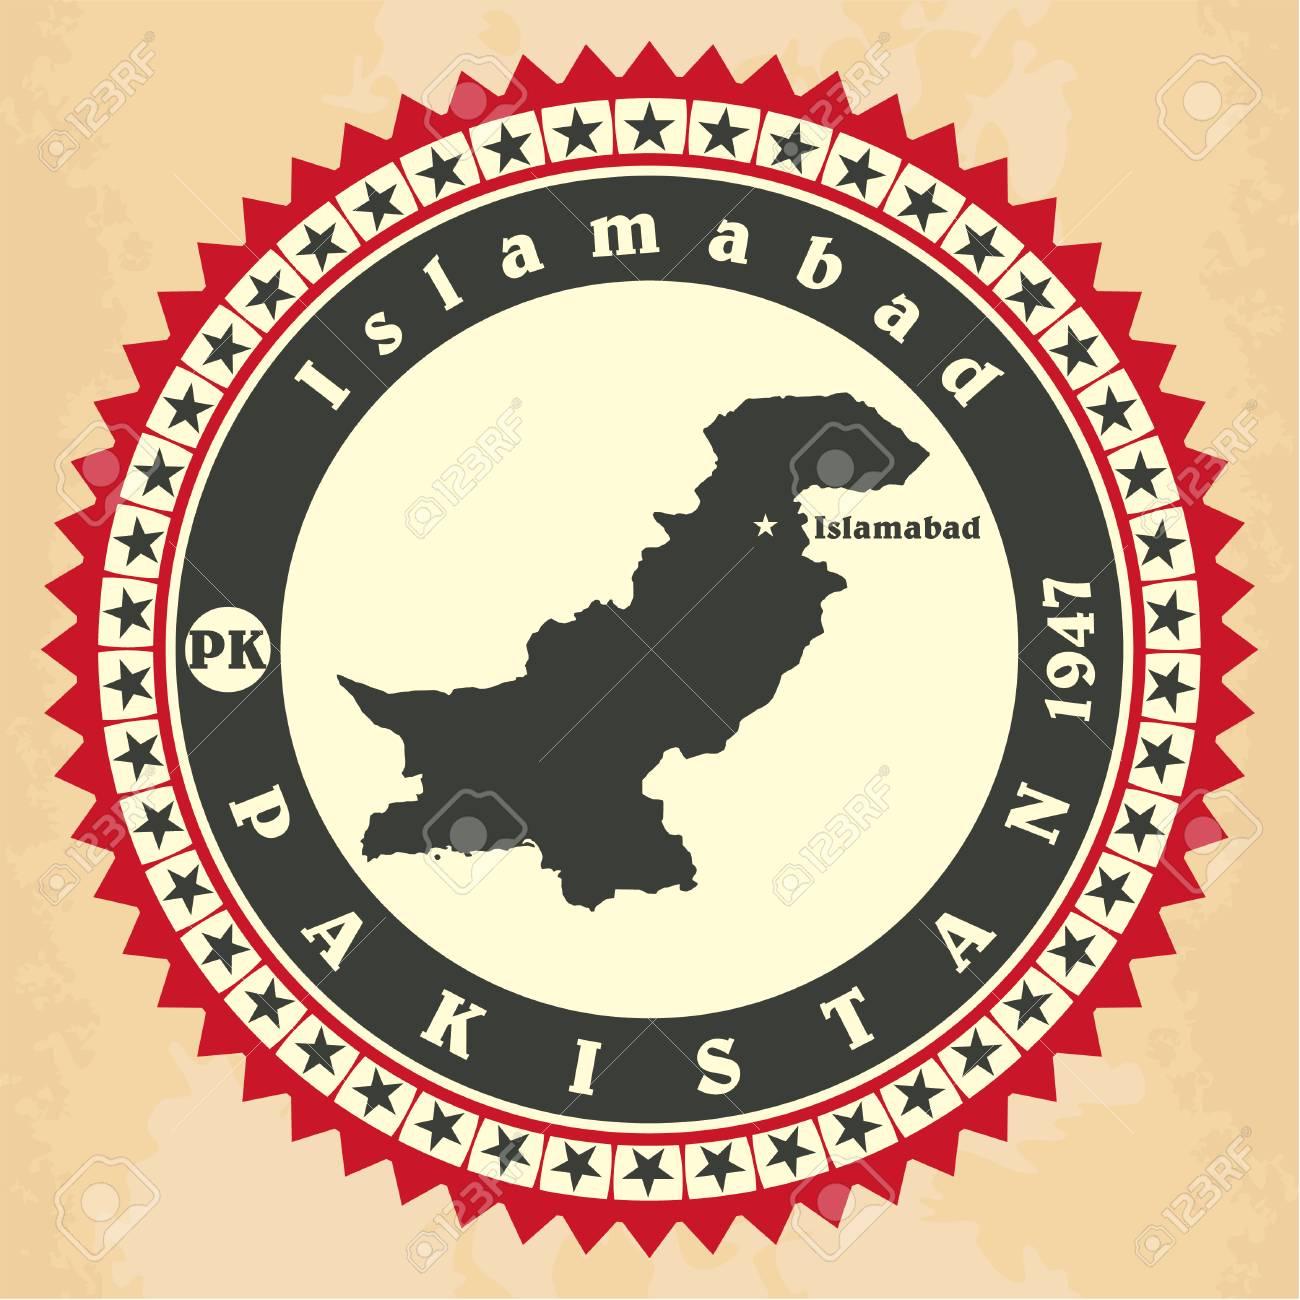 Vintage label-sticker cards of Pakistan Stock Vector - 28023595